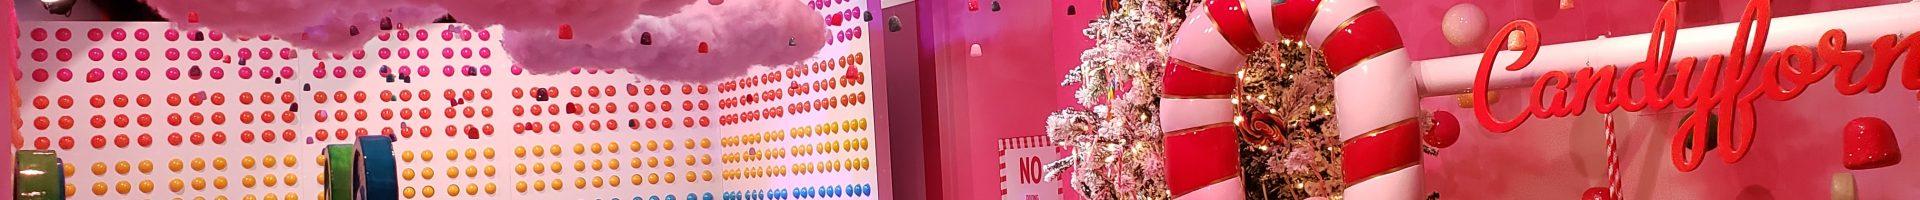 Fa La Land: LA's Christmas Experience and Photo Stop Pop-Up